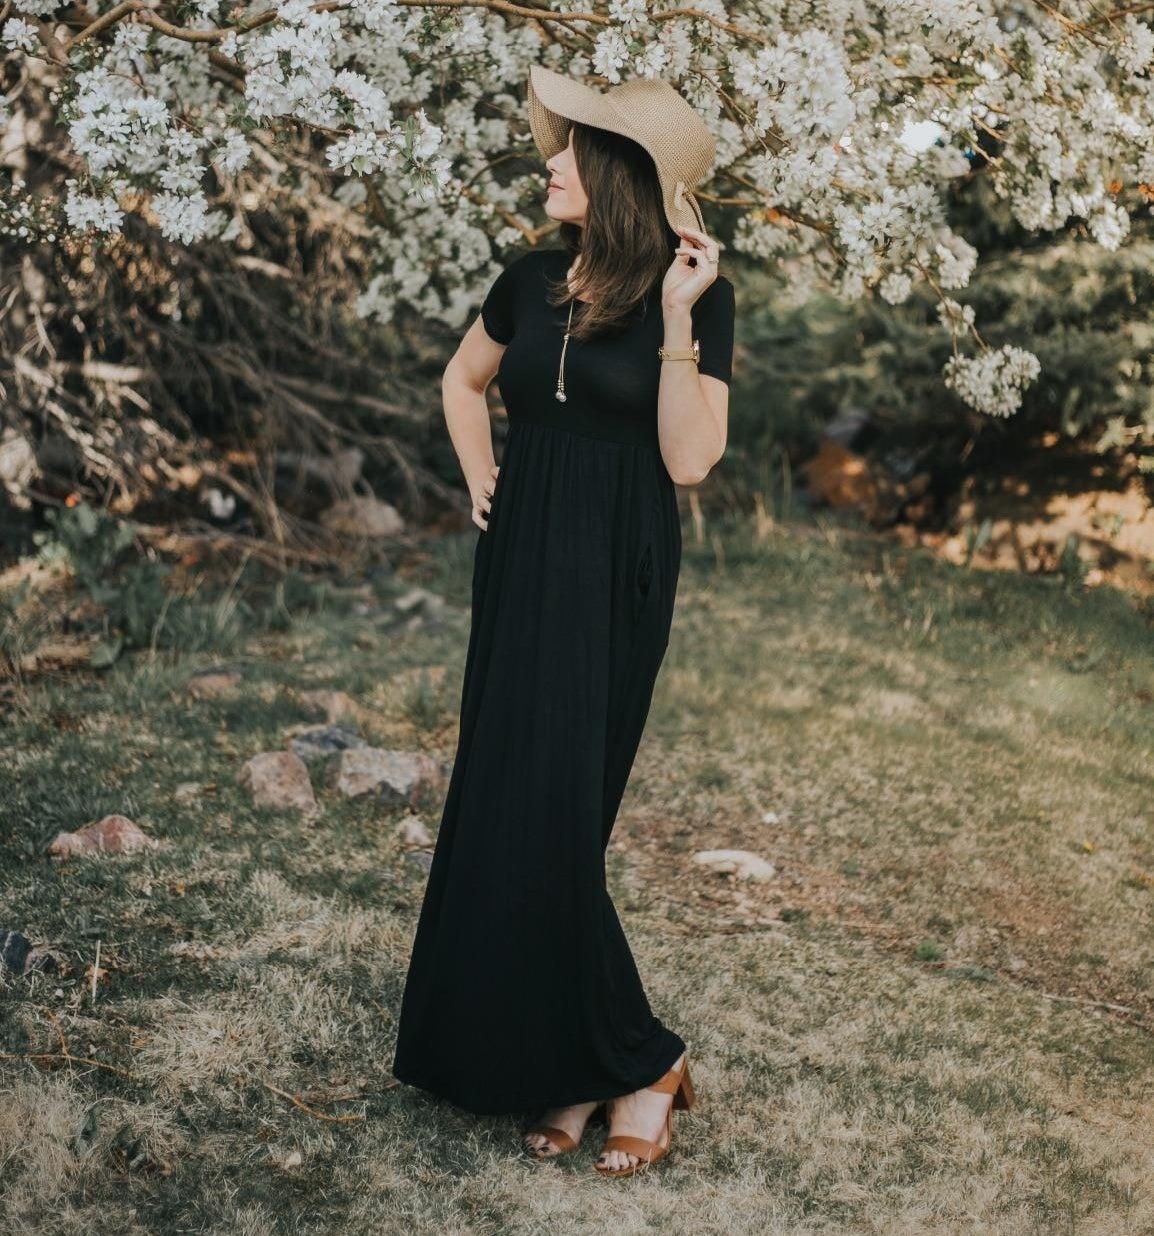 Reviewer wearing black maxi dress